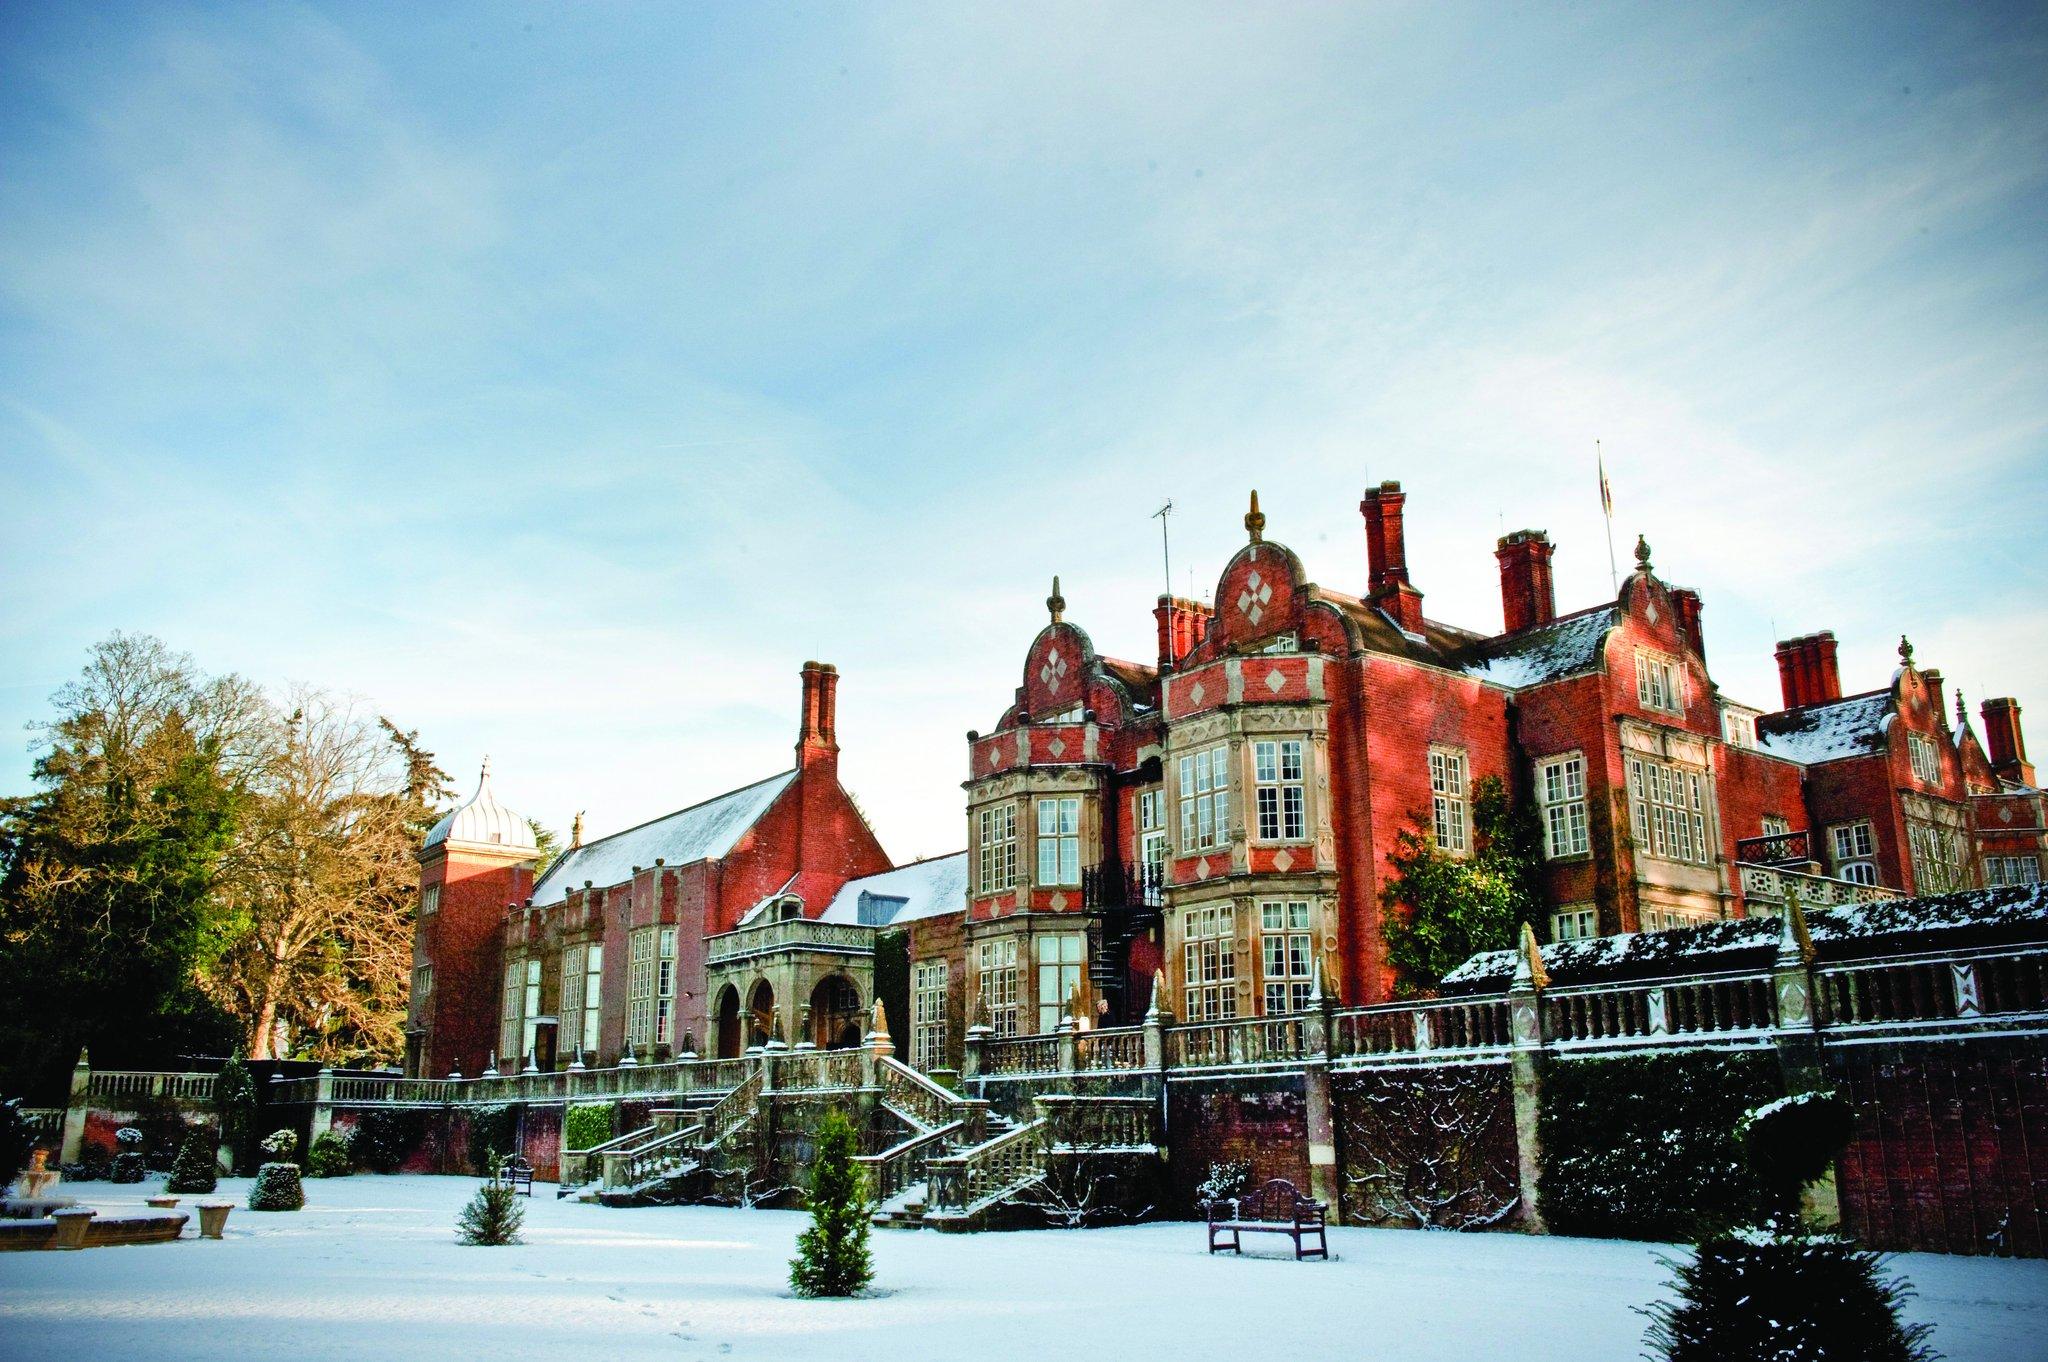 Winter at Tylney Hall